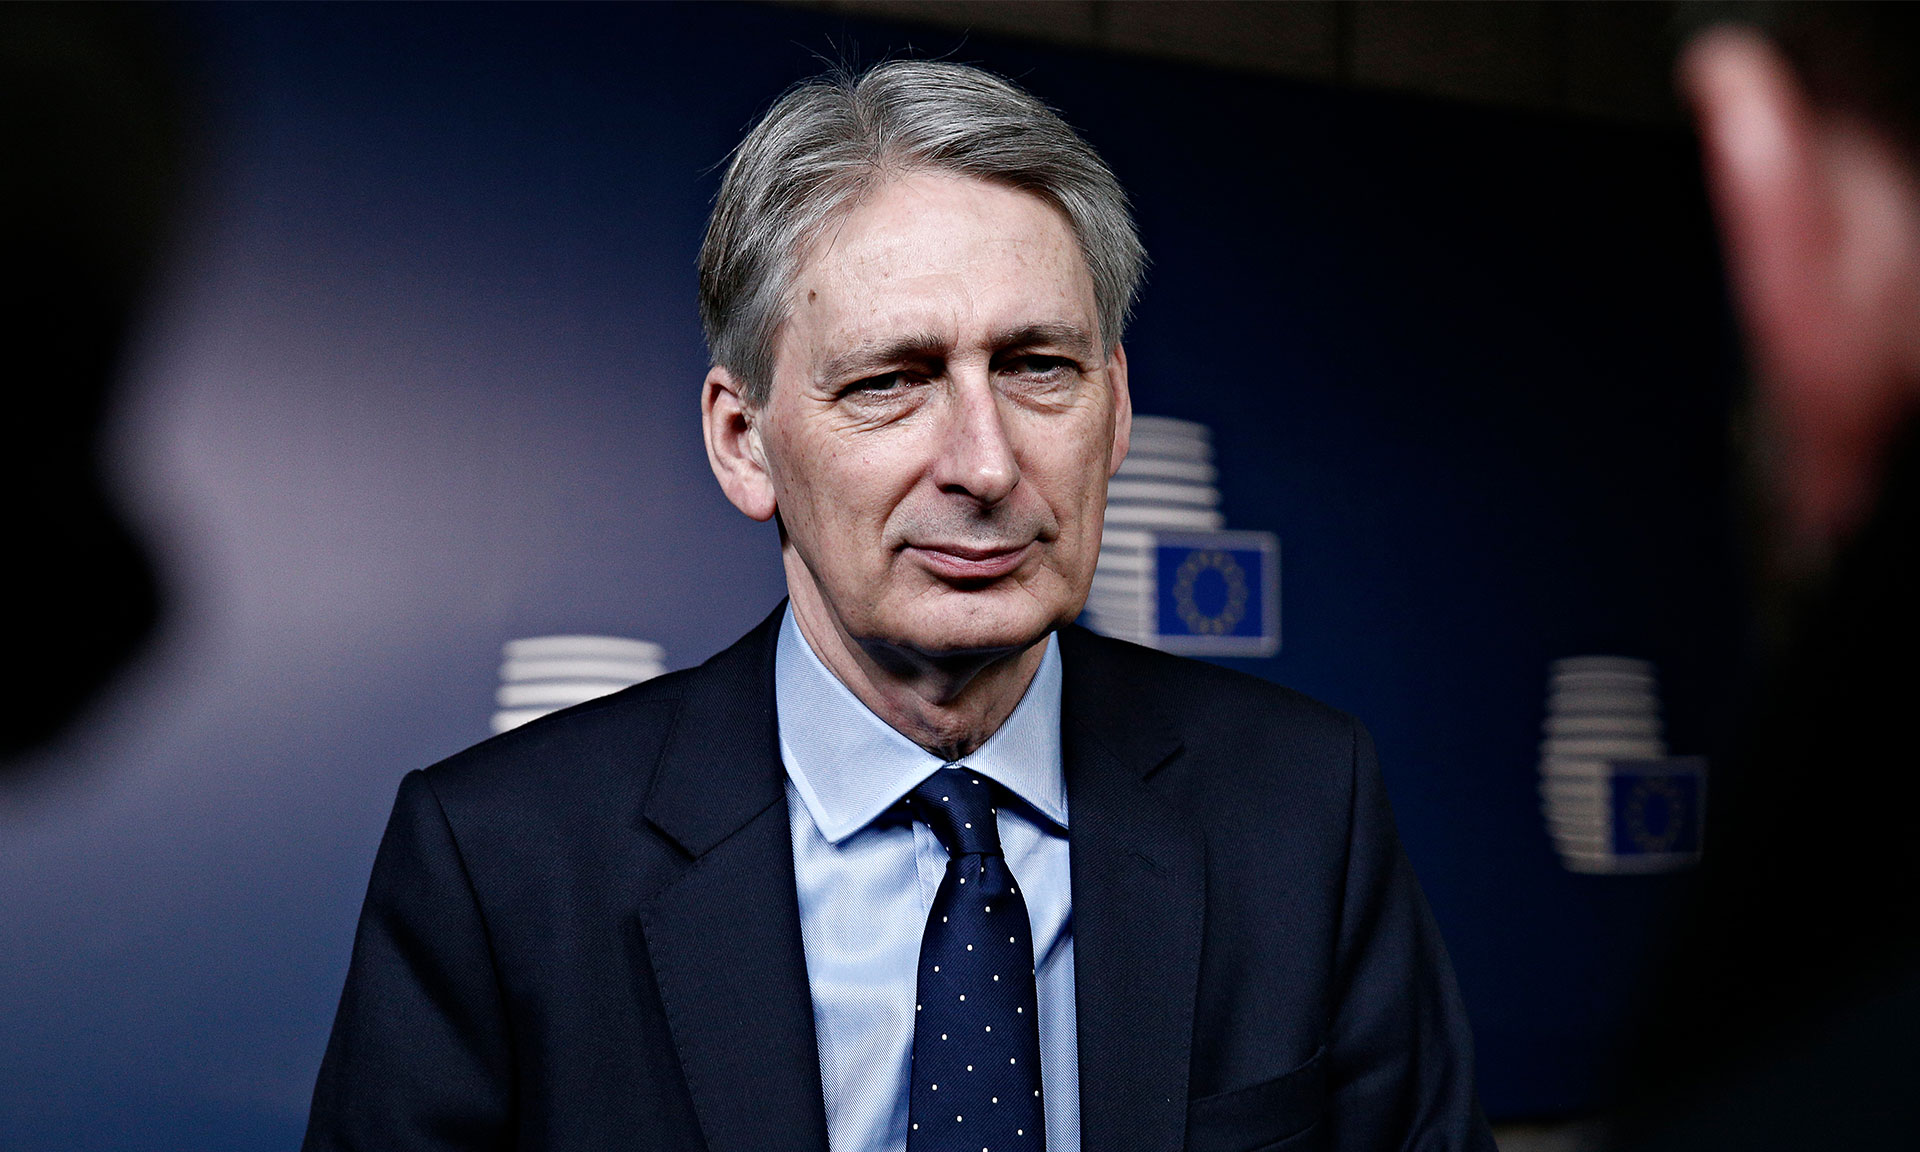 Autumn Budget 2018: IR35 reform and National Insurance